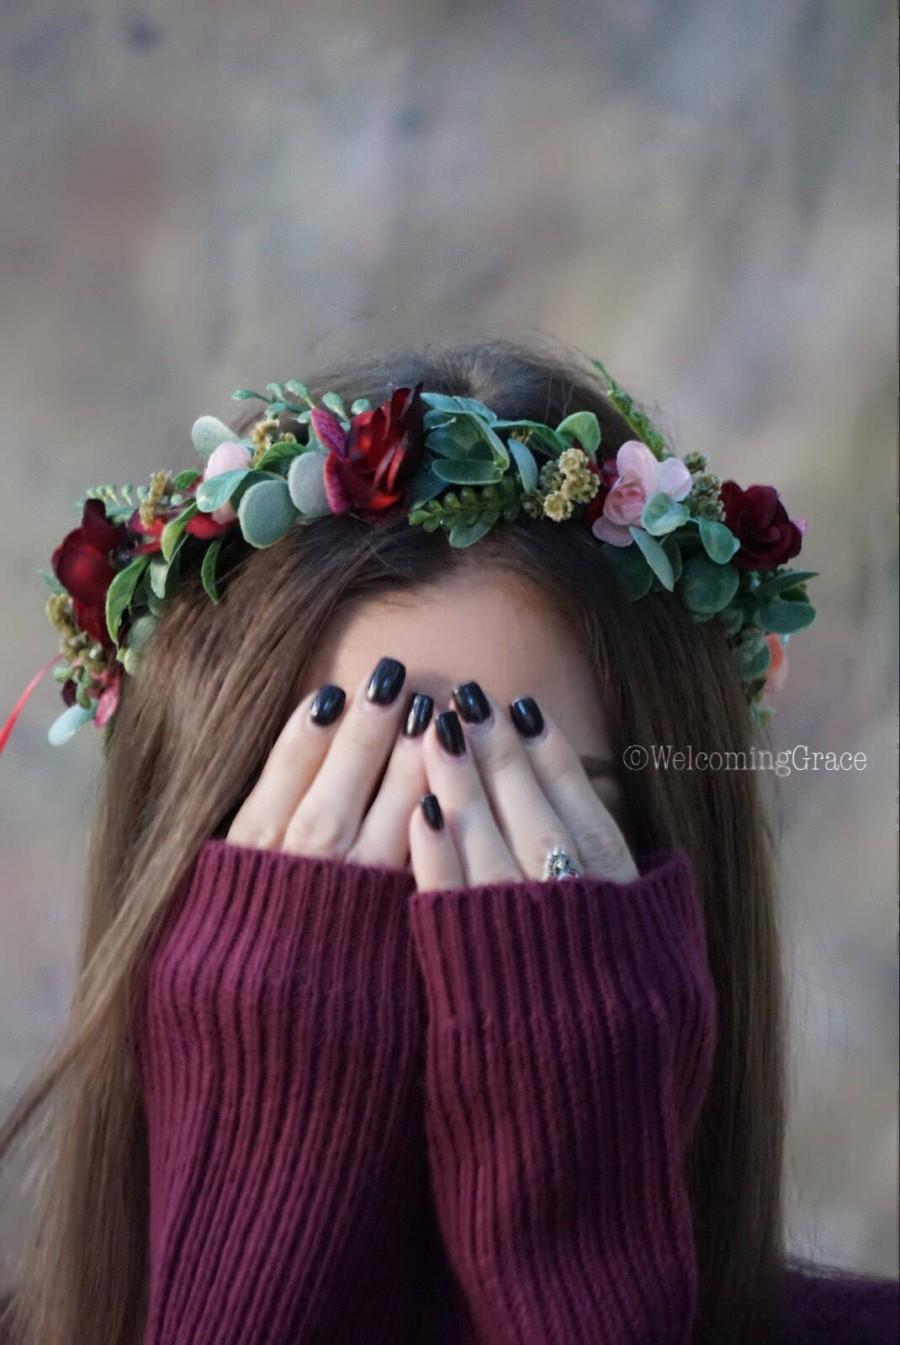 Flower crown wedding burgundy floral crown blush flower crown flower crown wedding burgundy floral crown blush flower crown greenery maroon crown christmas flower crown bridal flower crown wedding izmirmasajfo